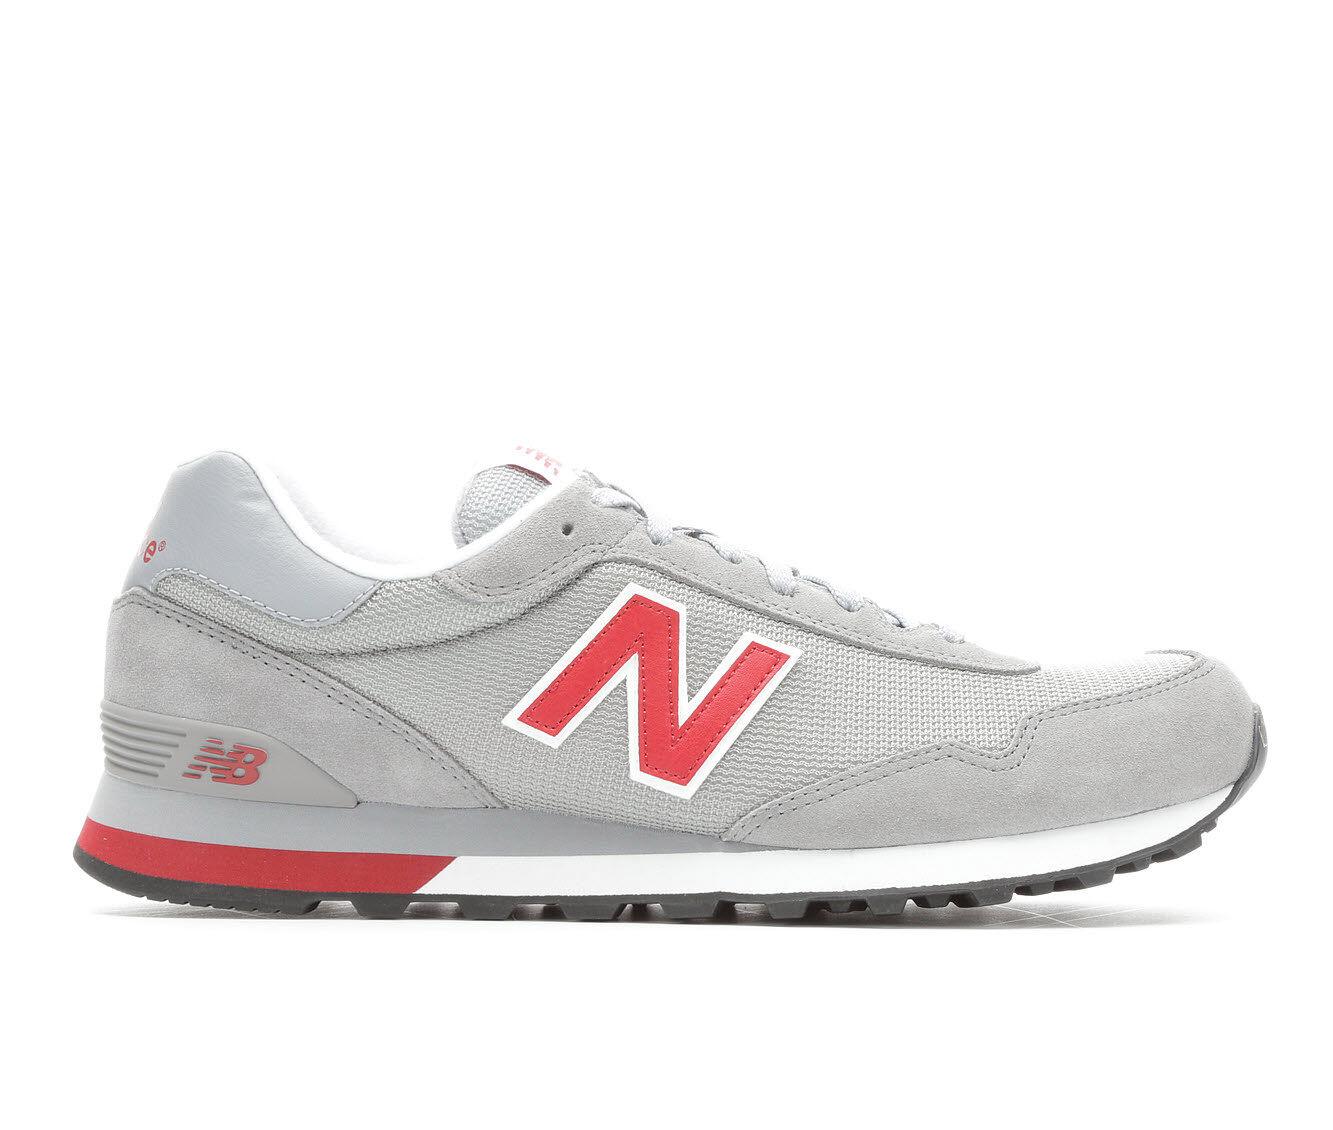 innovative design 625f2 98d33 Carnival Shoe Ml515 Retro Sneakers New Balance Men s pqaRAA